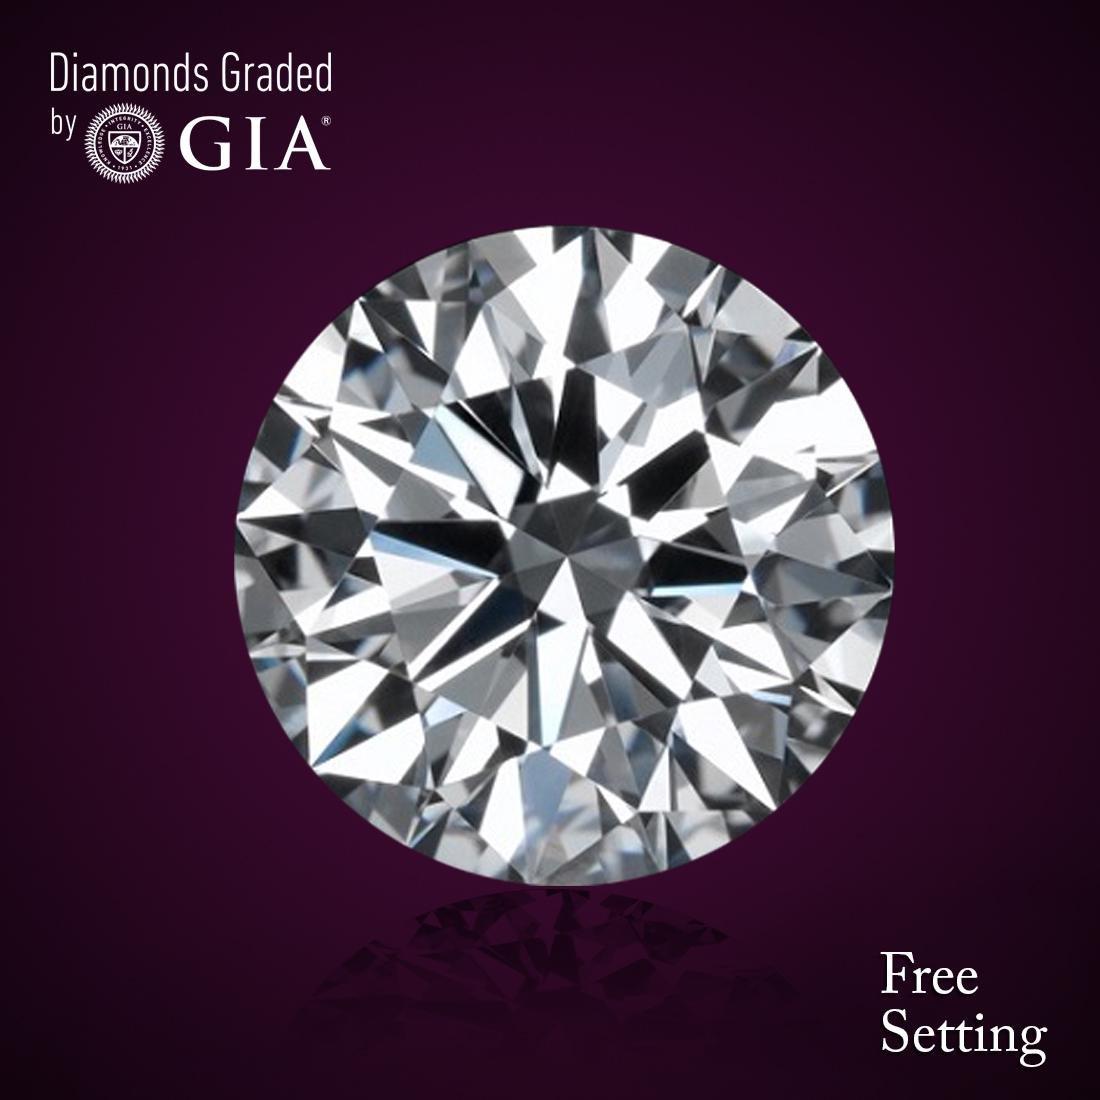 3.40 ct, Color G/VS2, Round cut Diamond 44% Off Rap